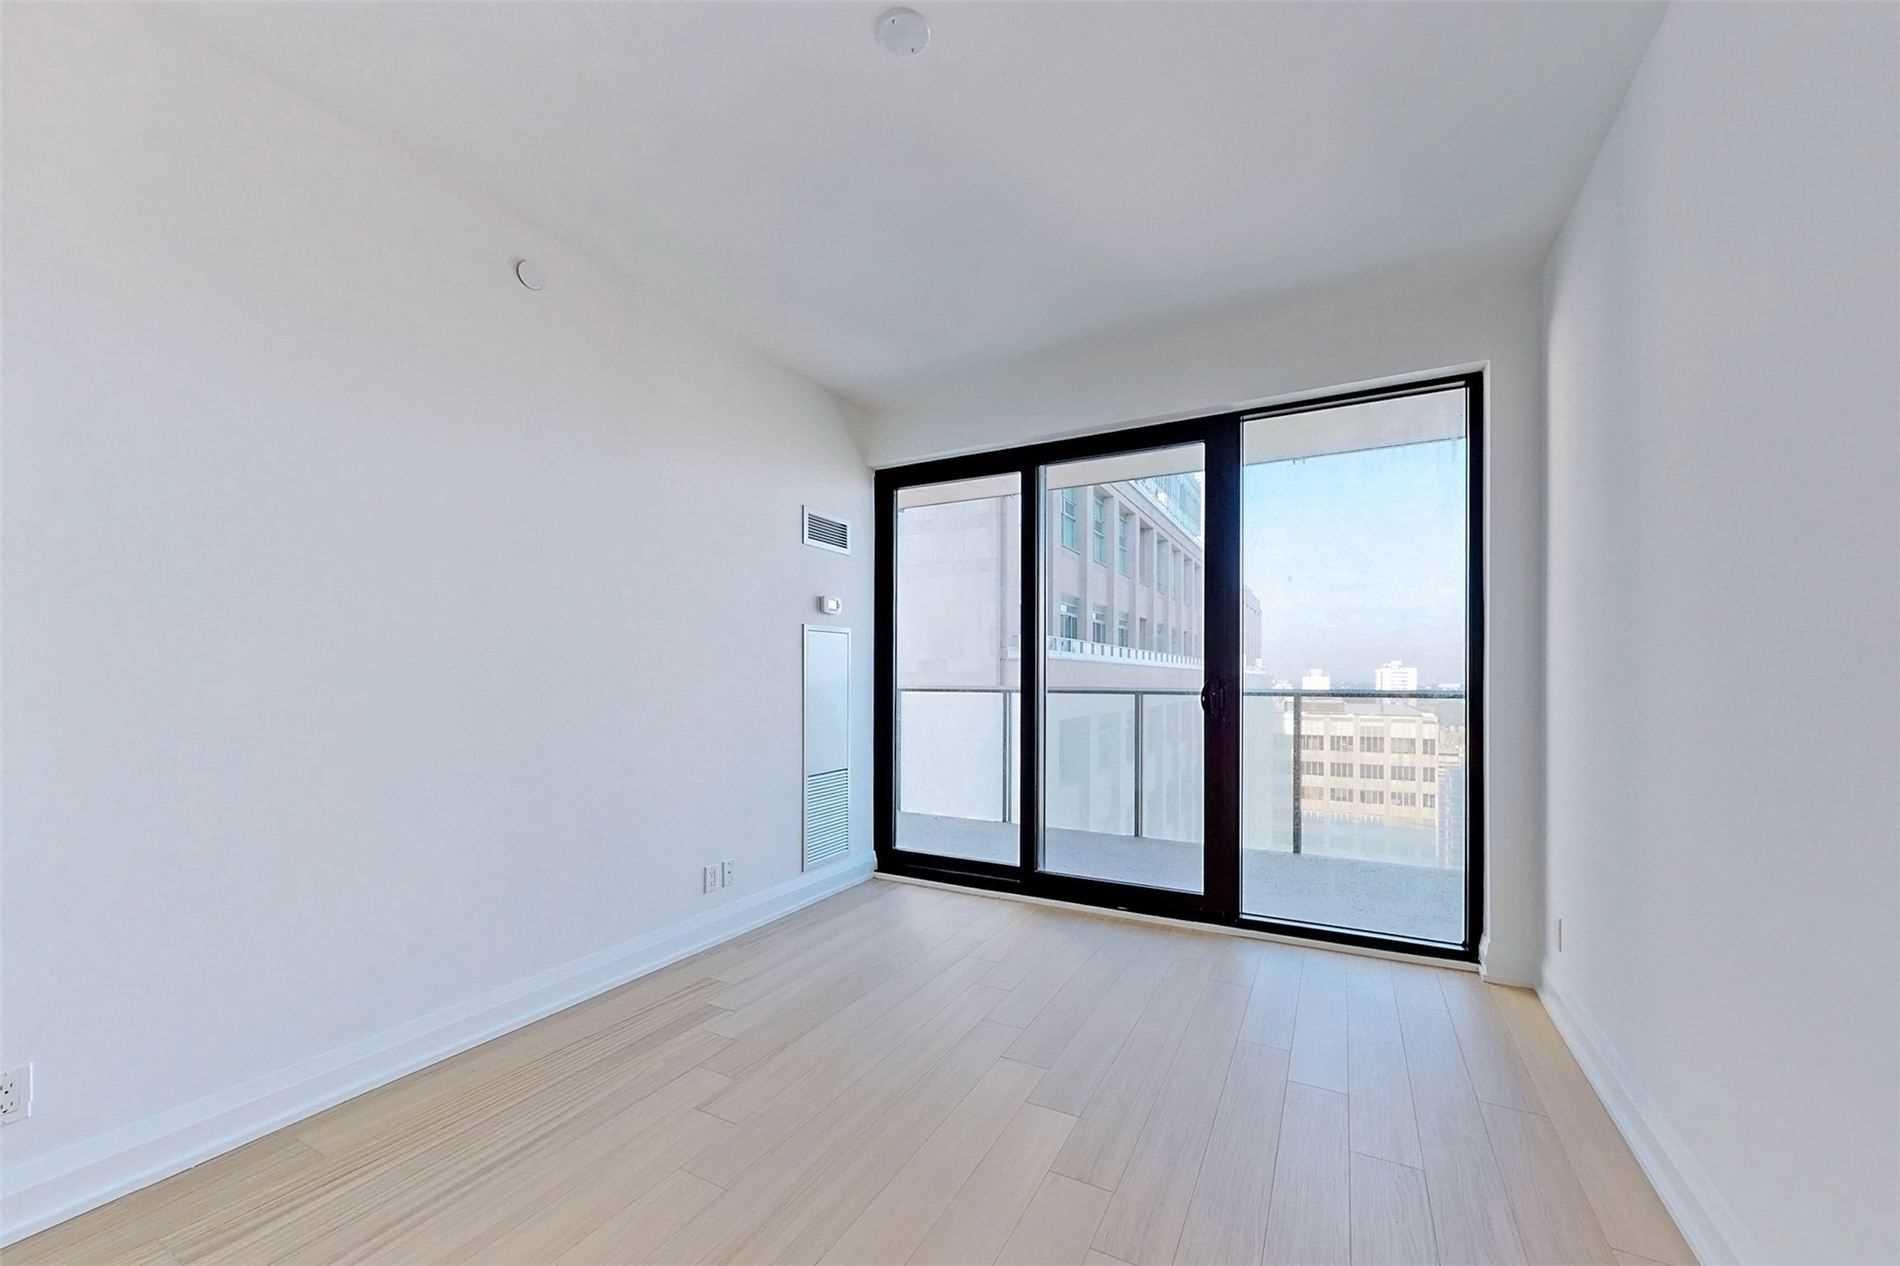 Condo Apt For Lease In Toronto , 2 Bedrooms Bedrooms, ,3 BathroomsBathrooms,Condo Apt,For Lease,2510,Foxbar